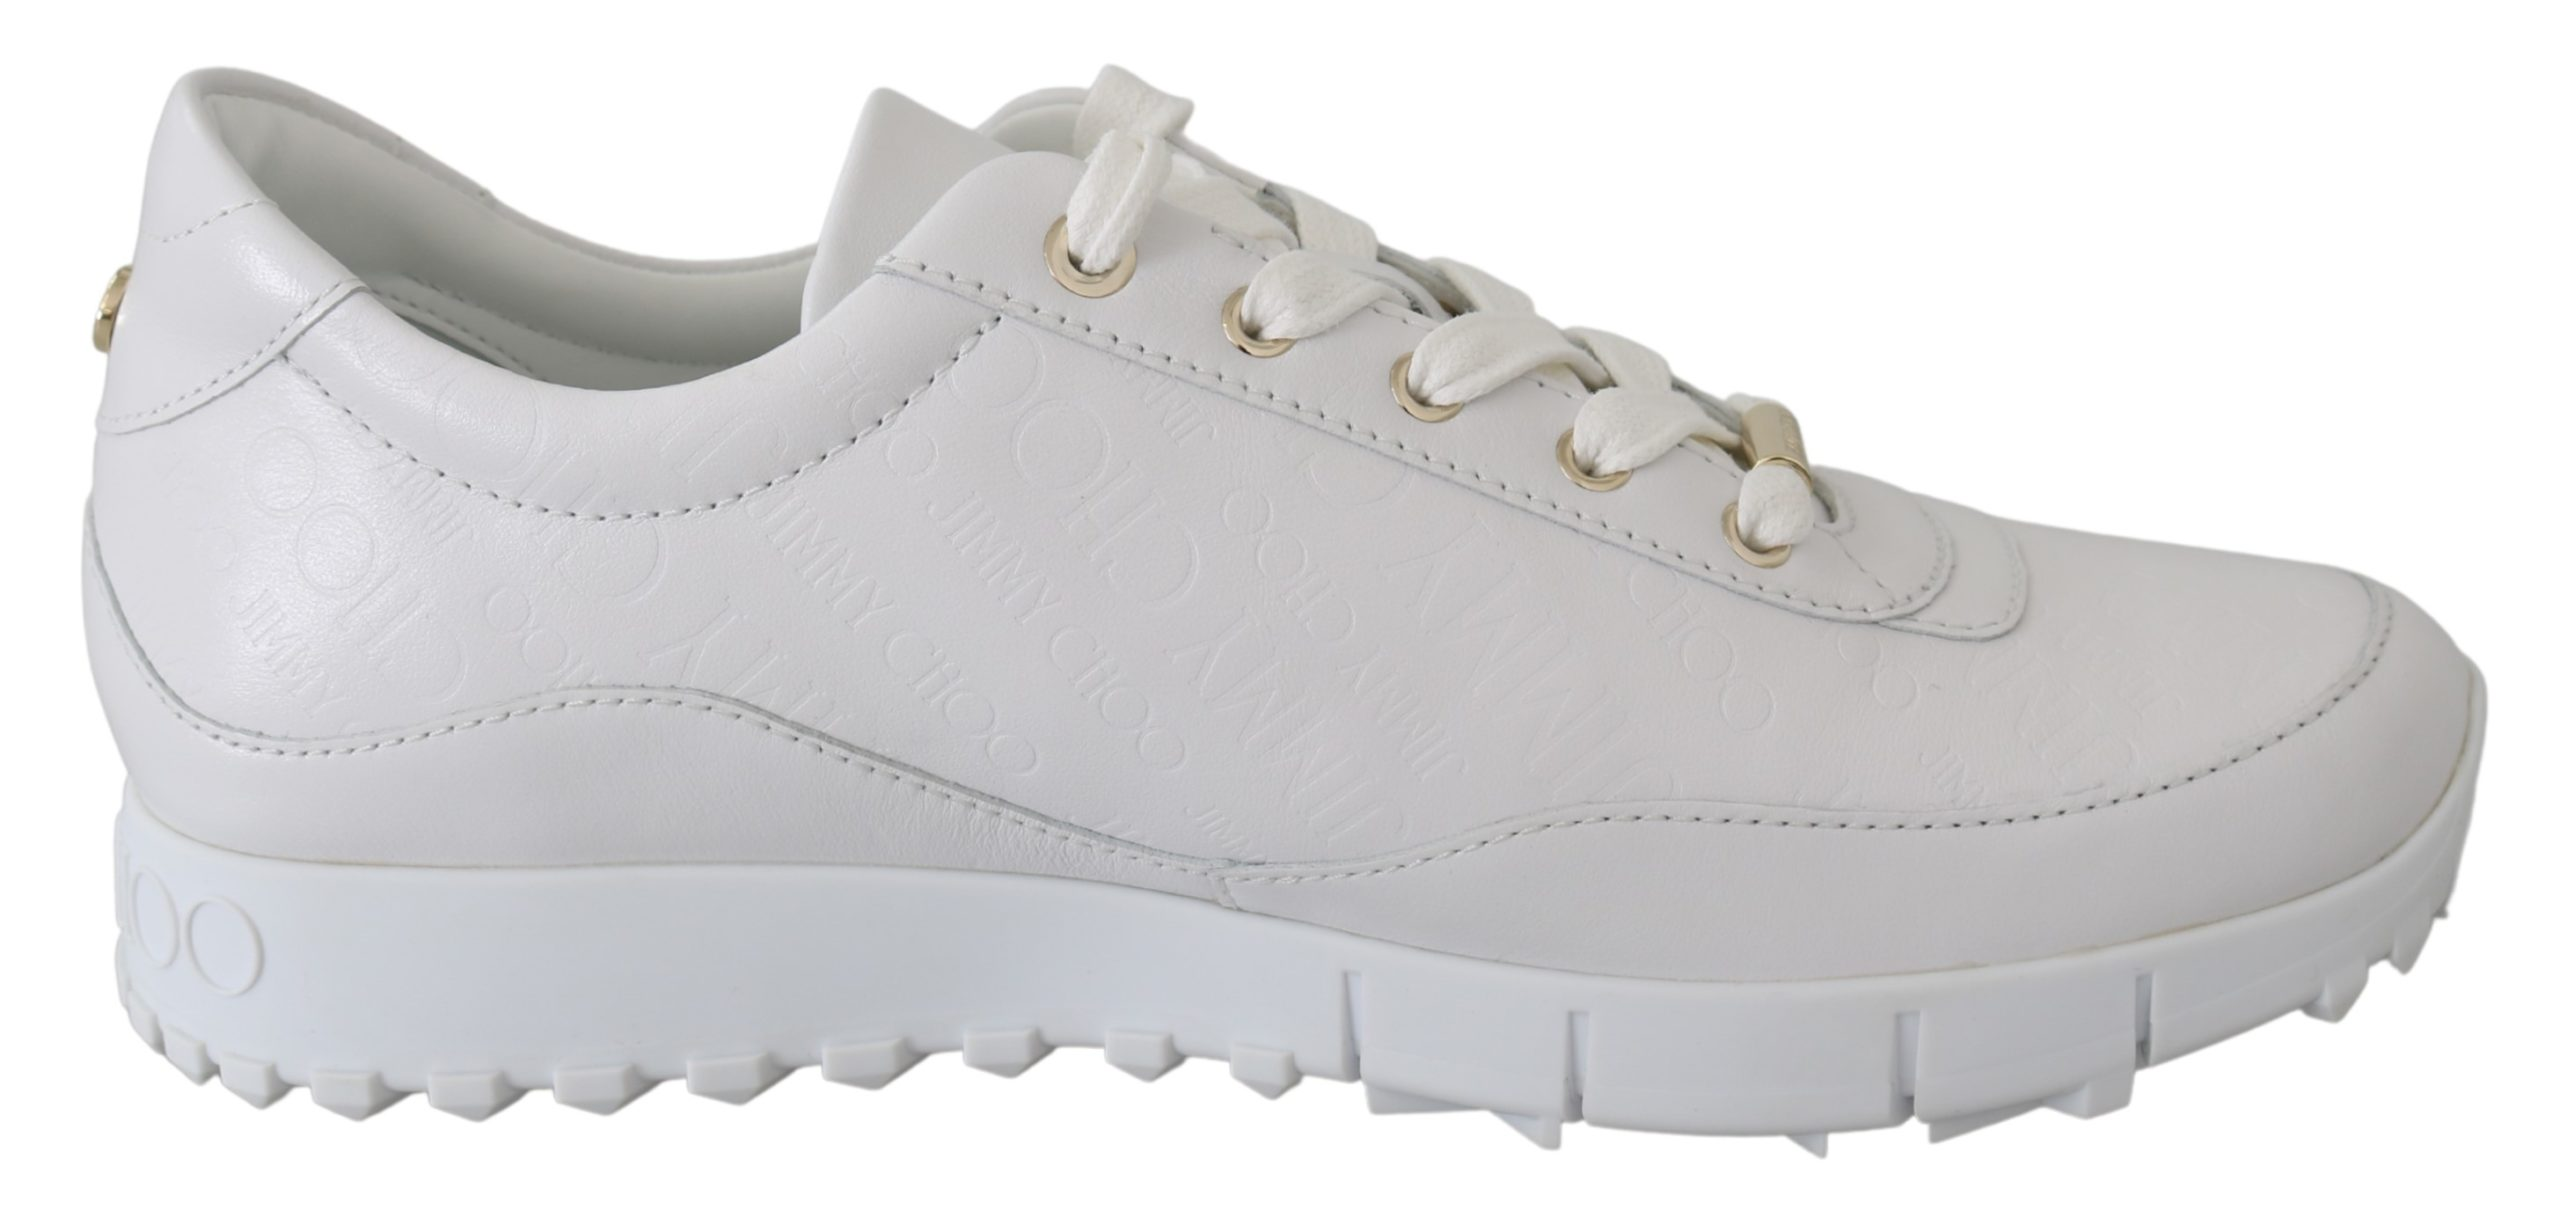 Jimmy Choo Women's Monza Sneakers White 192954492717 - EU38/US8